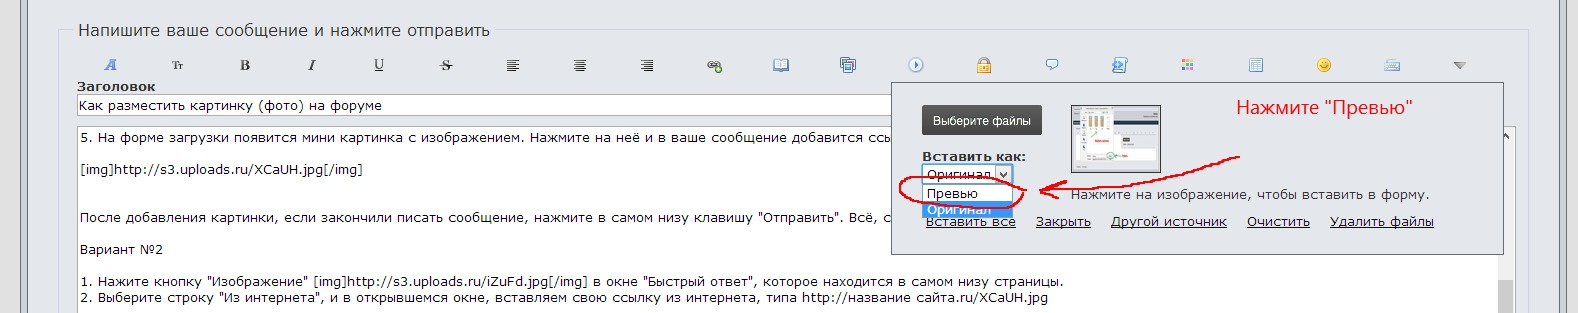 http://s6.uploads.ru/hAckX.jpg